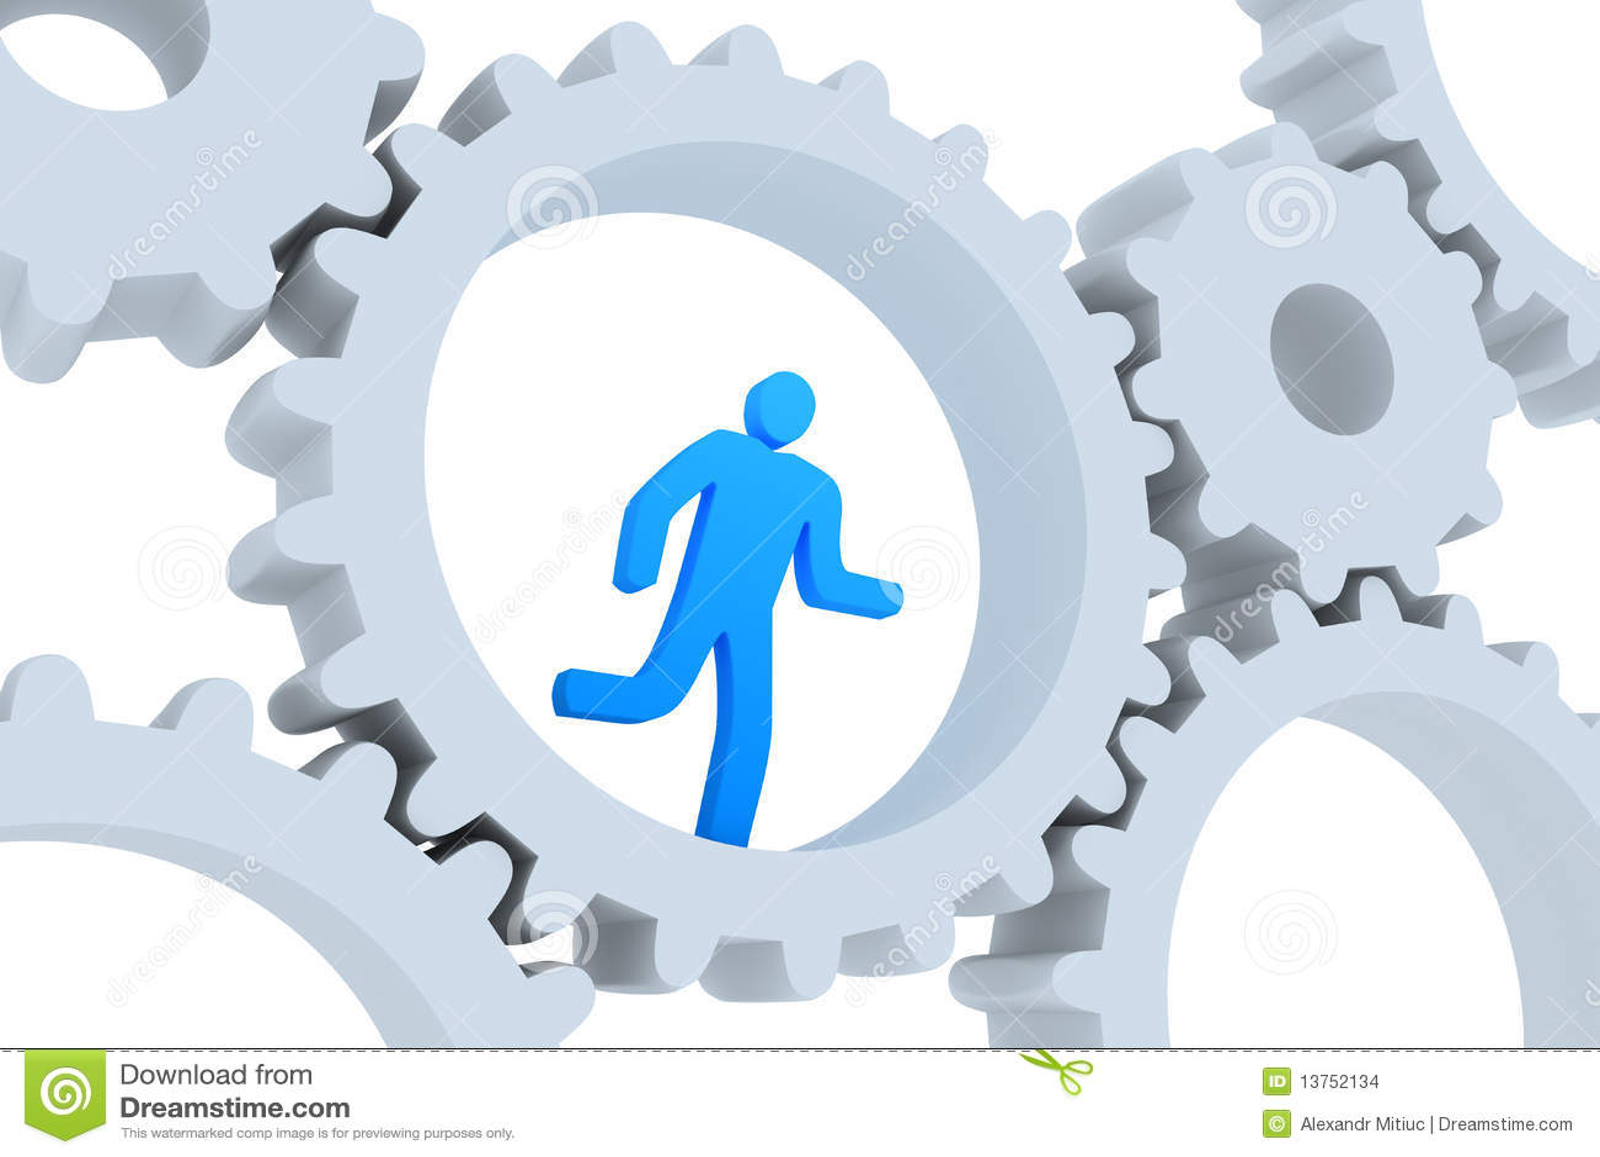 Rat running - Business concept